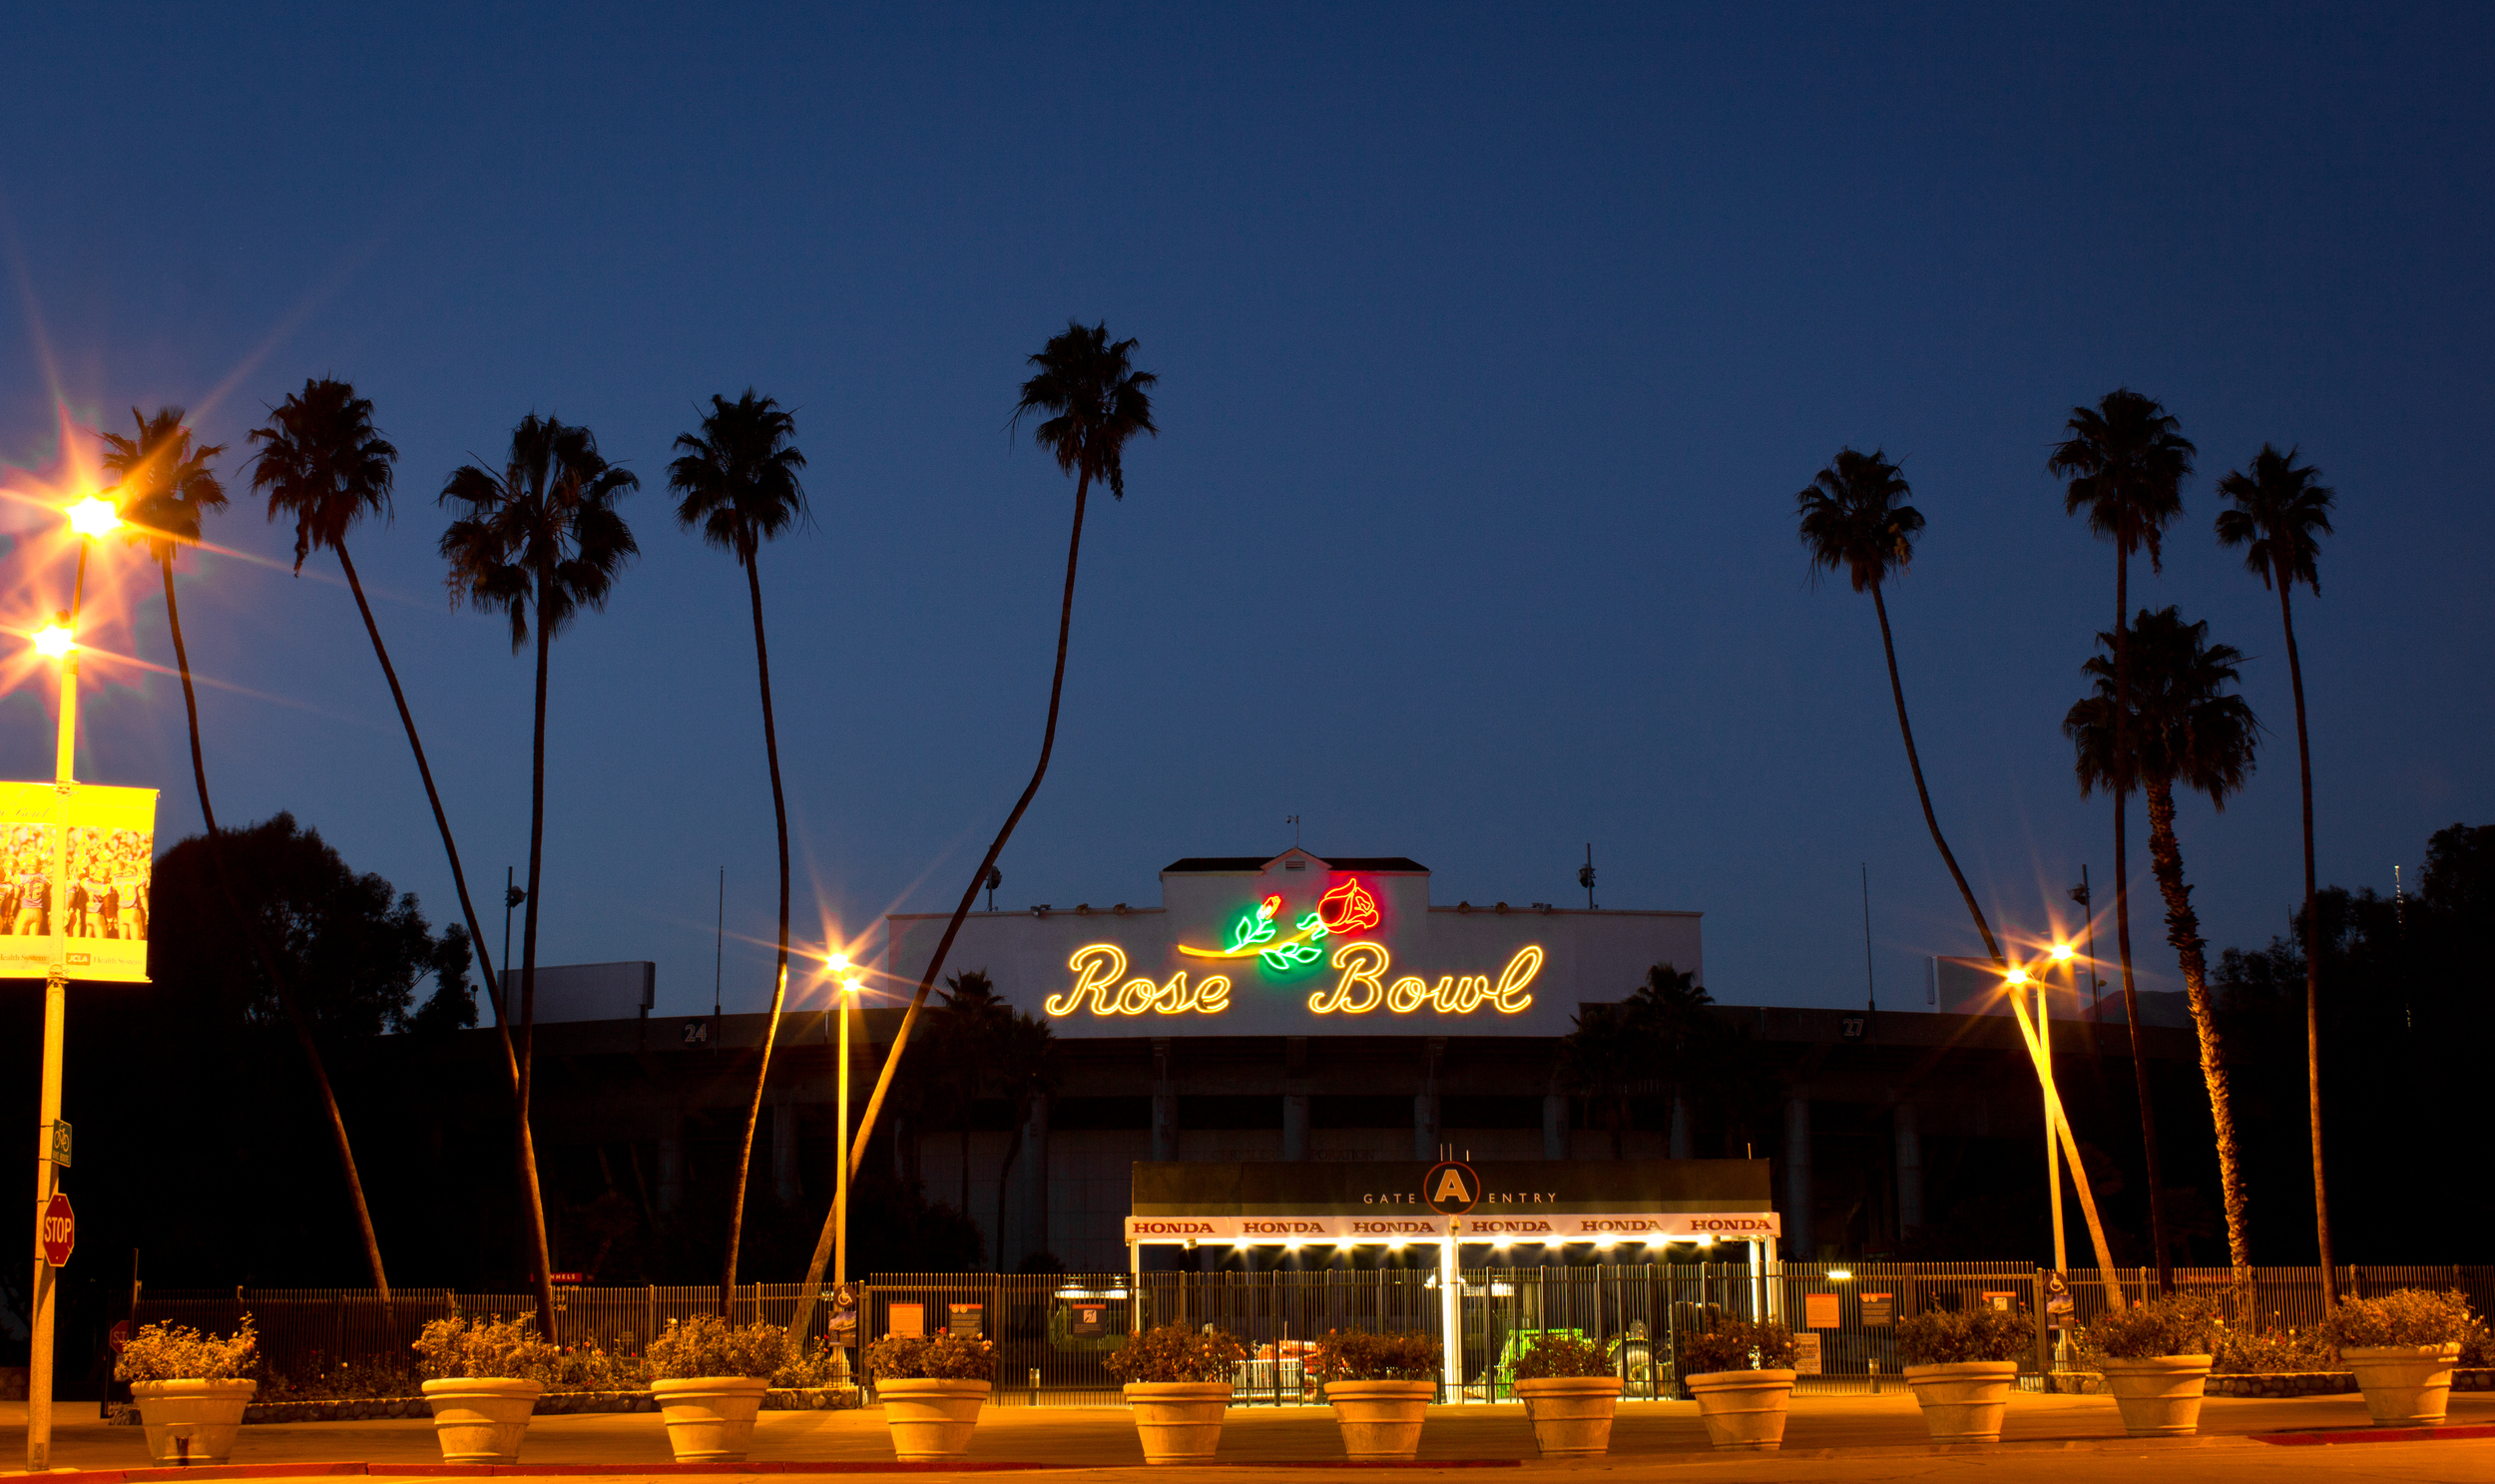 Rose Bowl Pasadena Rollie Robles.jpg